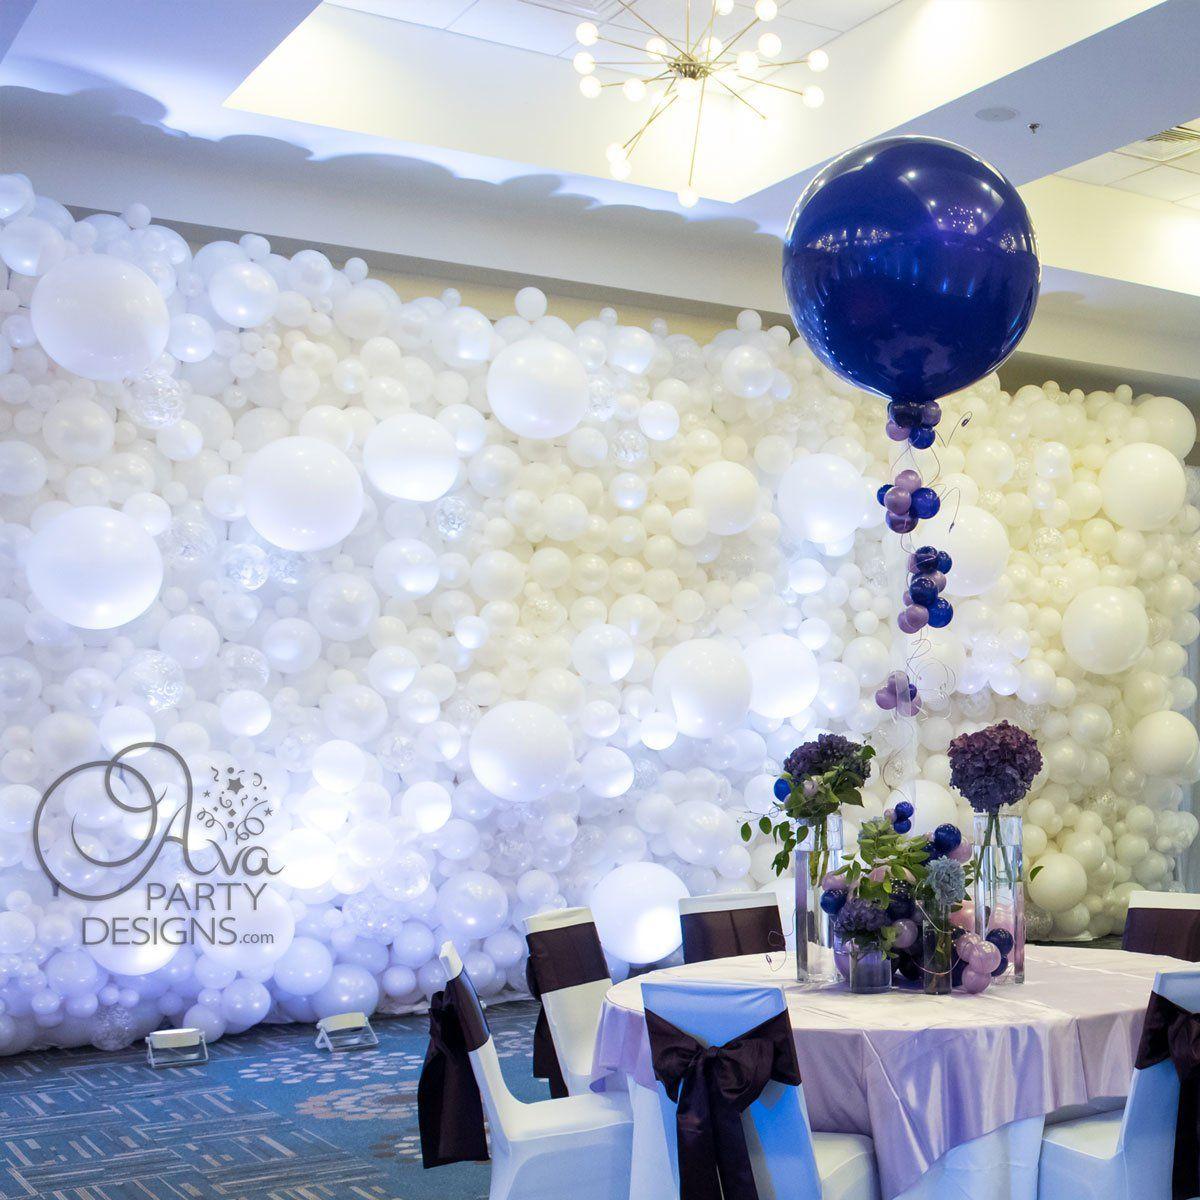 Balloon Decor Gallery Ava Party Designs Ct Ny Black And